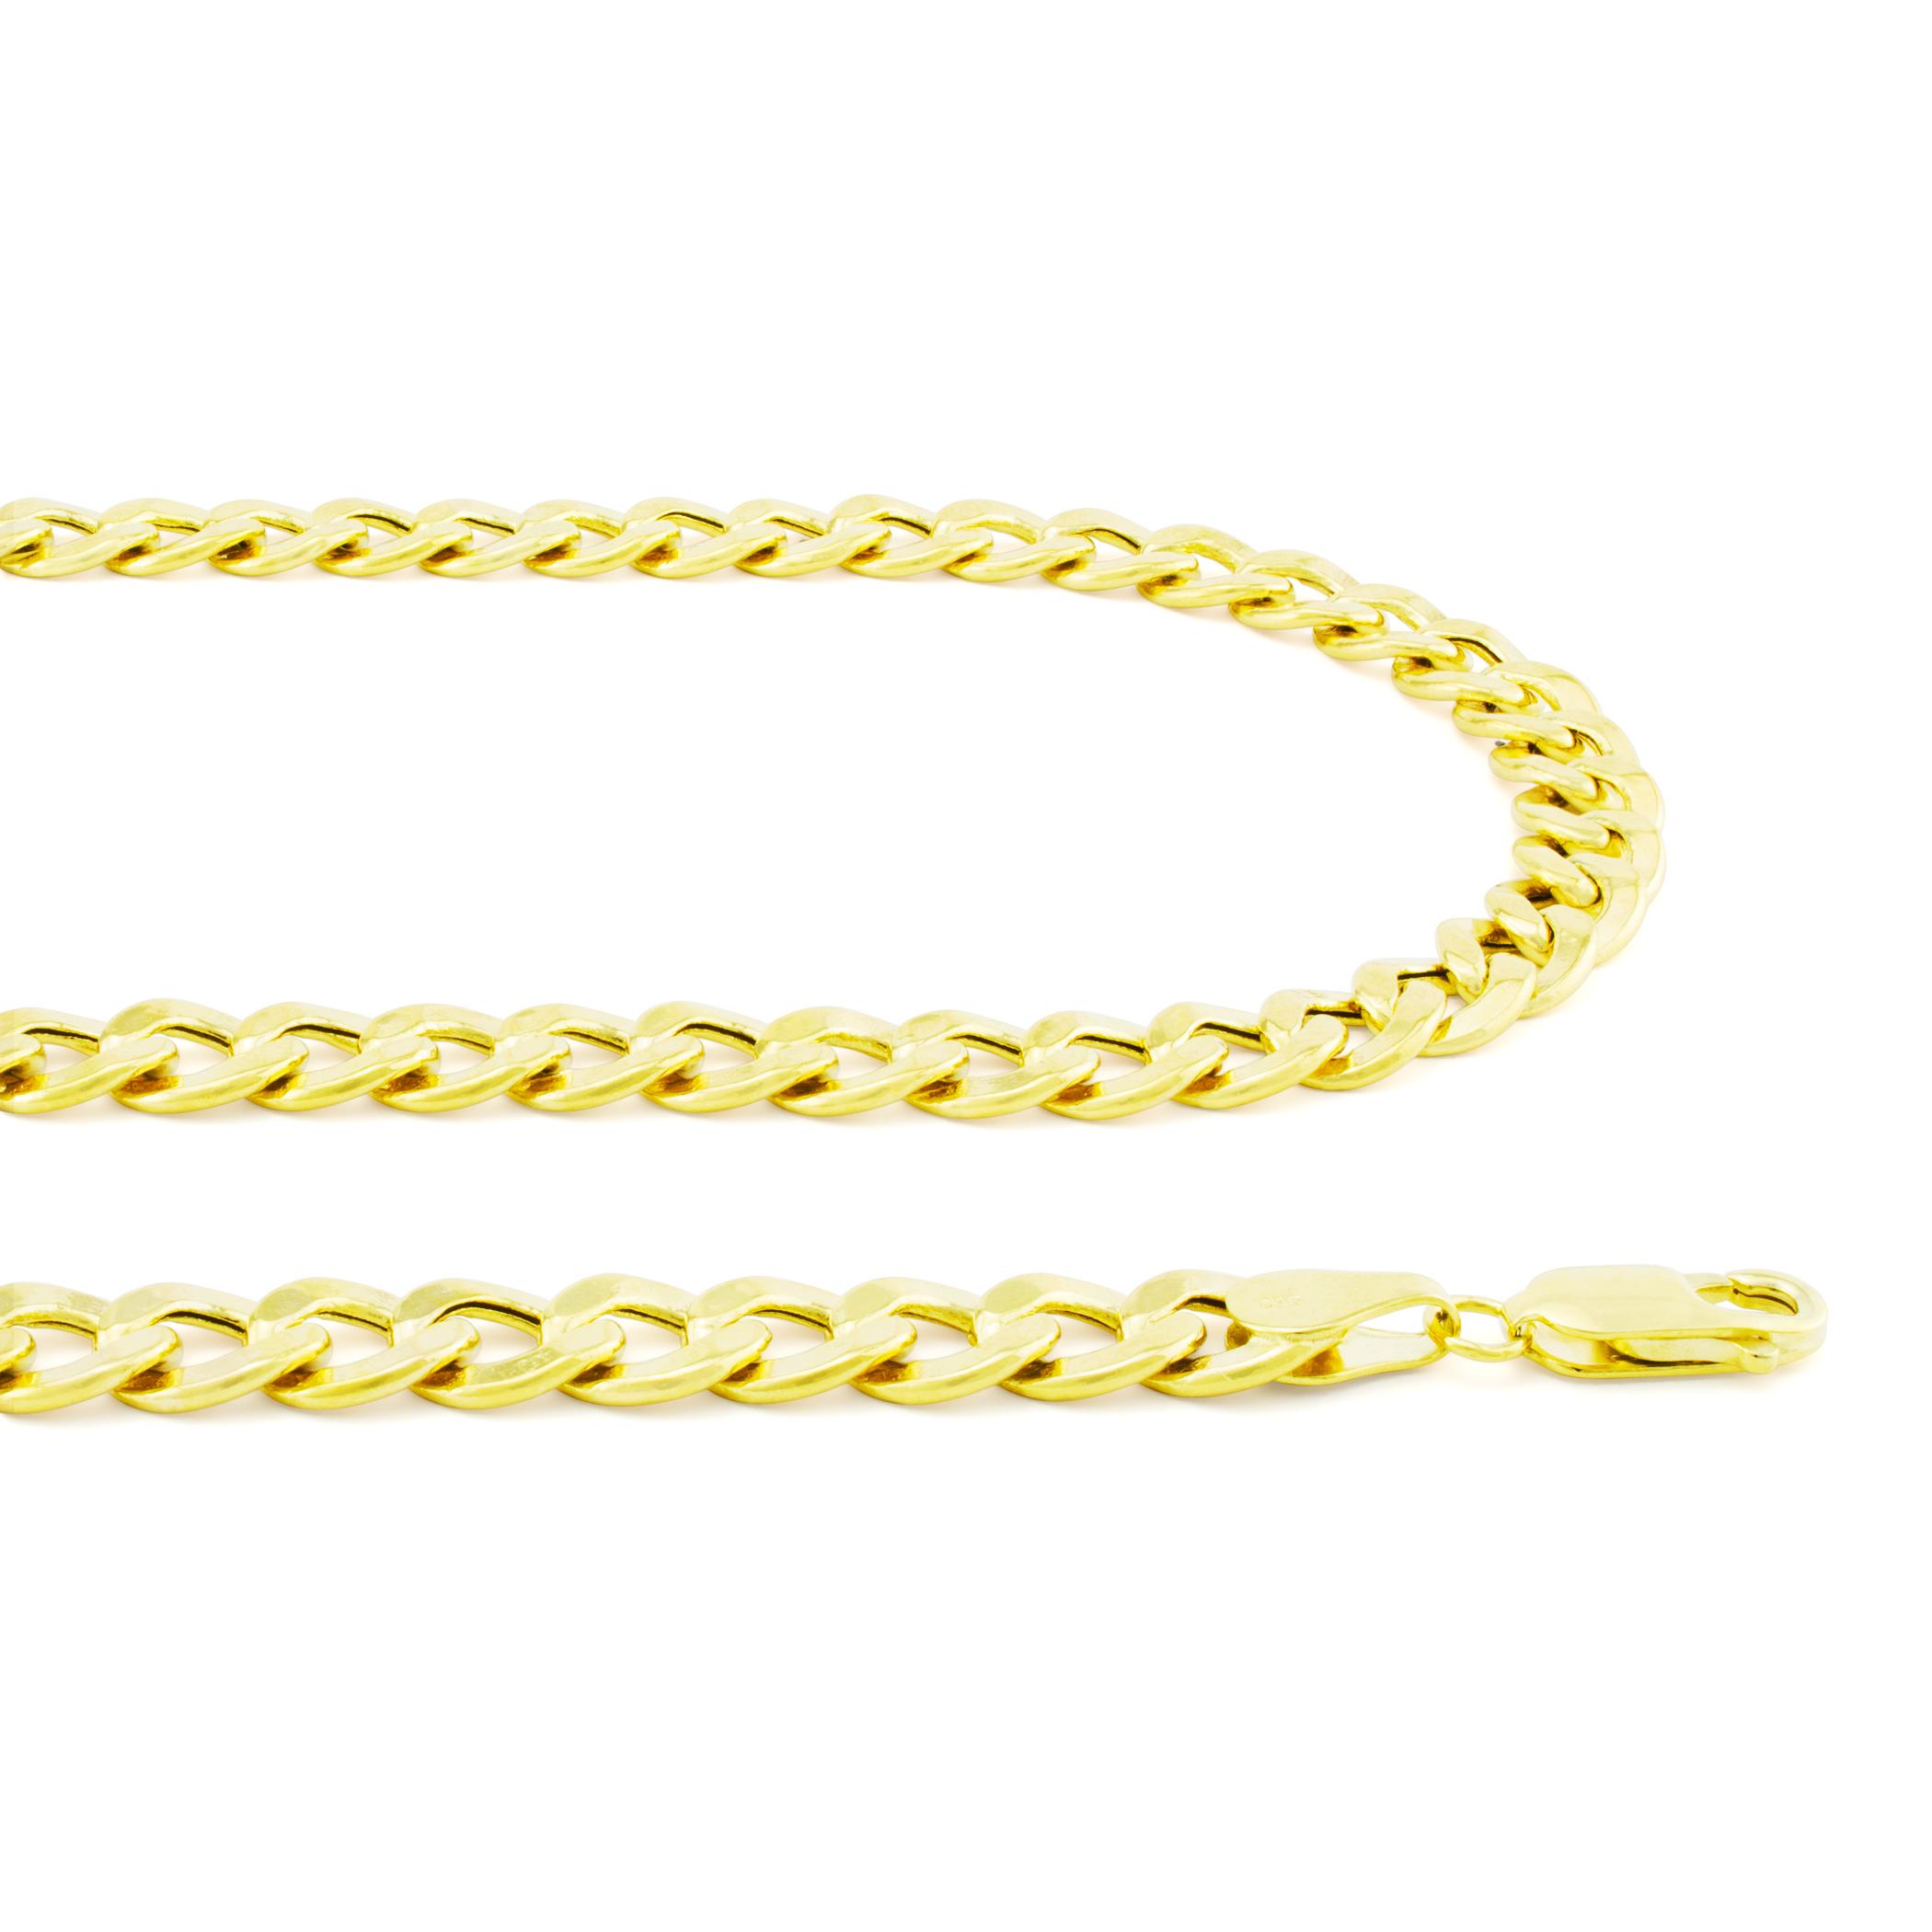 14K-Yellow-Gold-5-5mm-Italian-Curb-Cuban-Link-Chain-Bracelet-Mens-Women-7-034-8-034-9-034 thumbnail 21